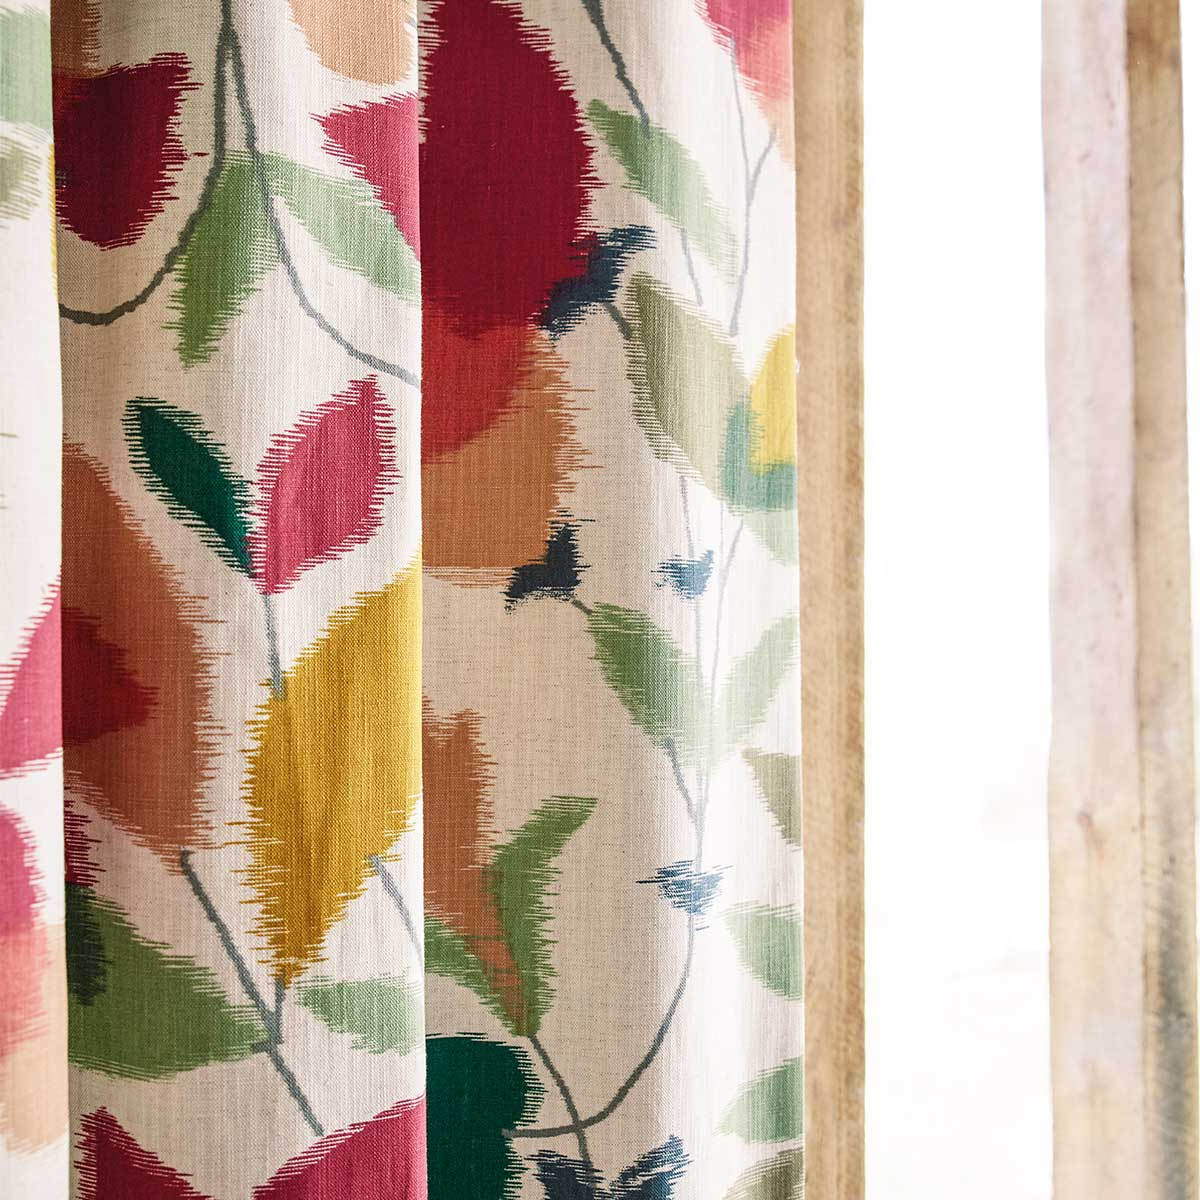 Scion Akira Berry / Ochre / Pistachio Fabric - Product code: 120750